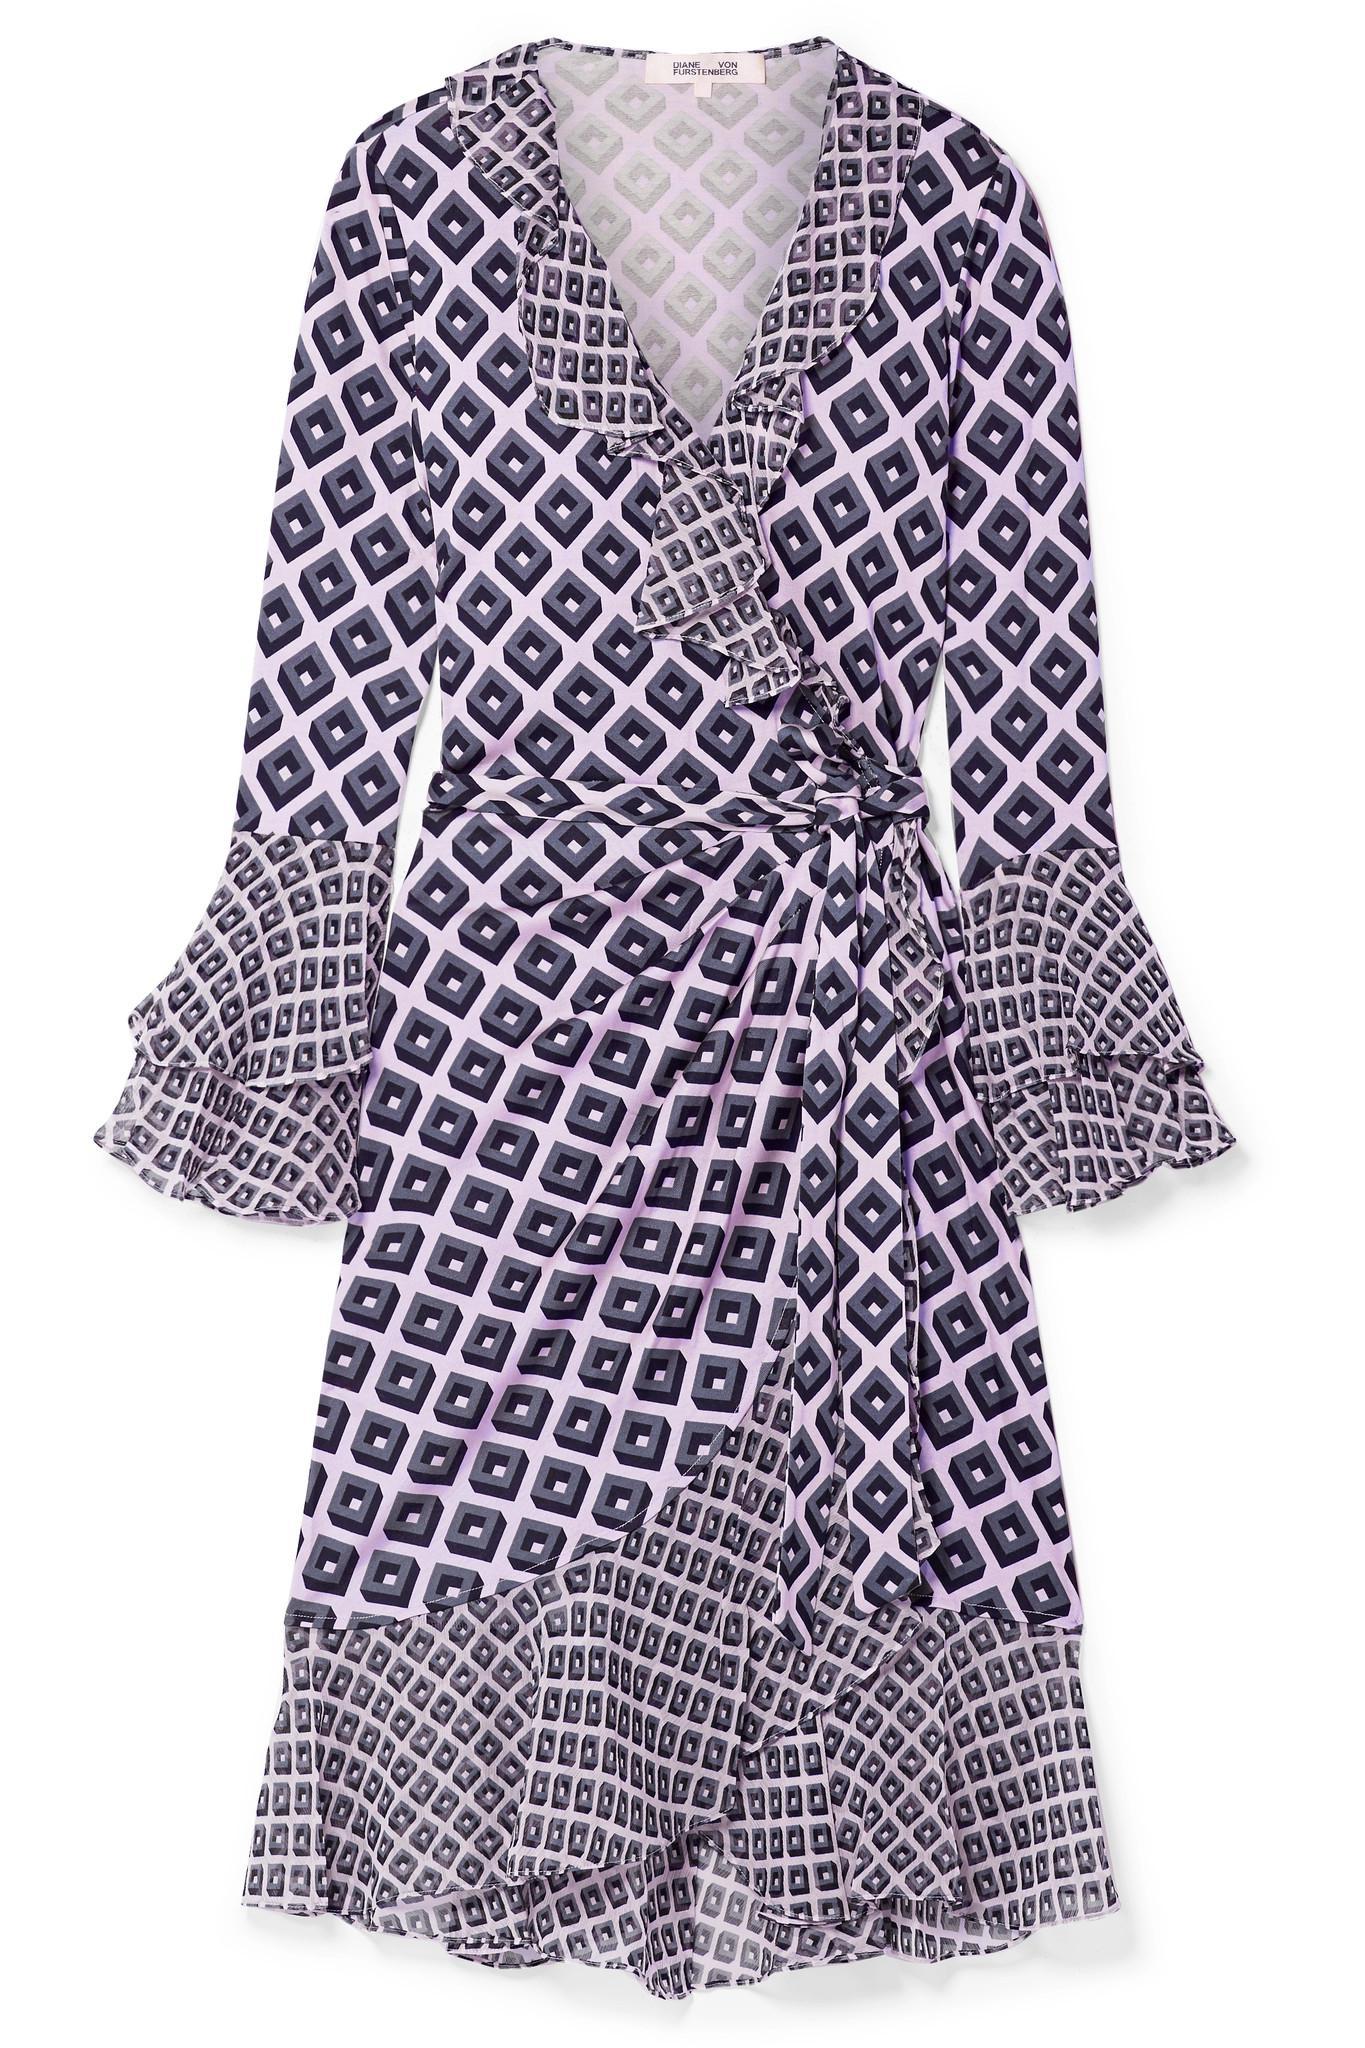 de809a11f58c1a Diane von Furstenberg - Blue Ruffled Printed Silk-crepe And Chiffon Wrap  Dress - Lyst. View fullscreen